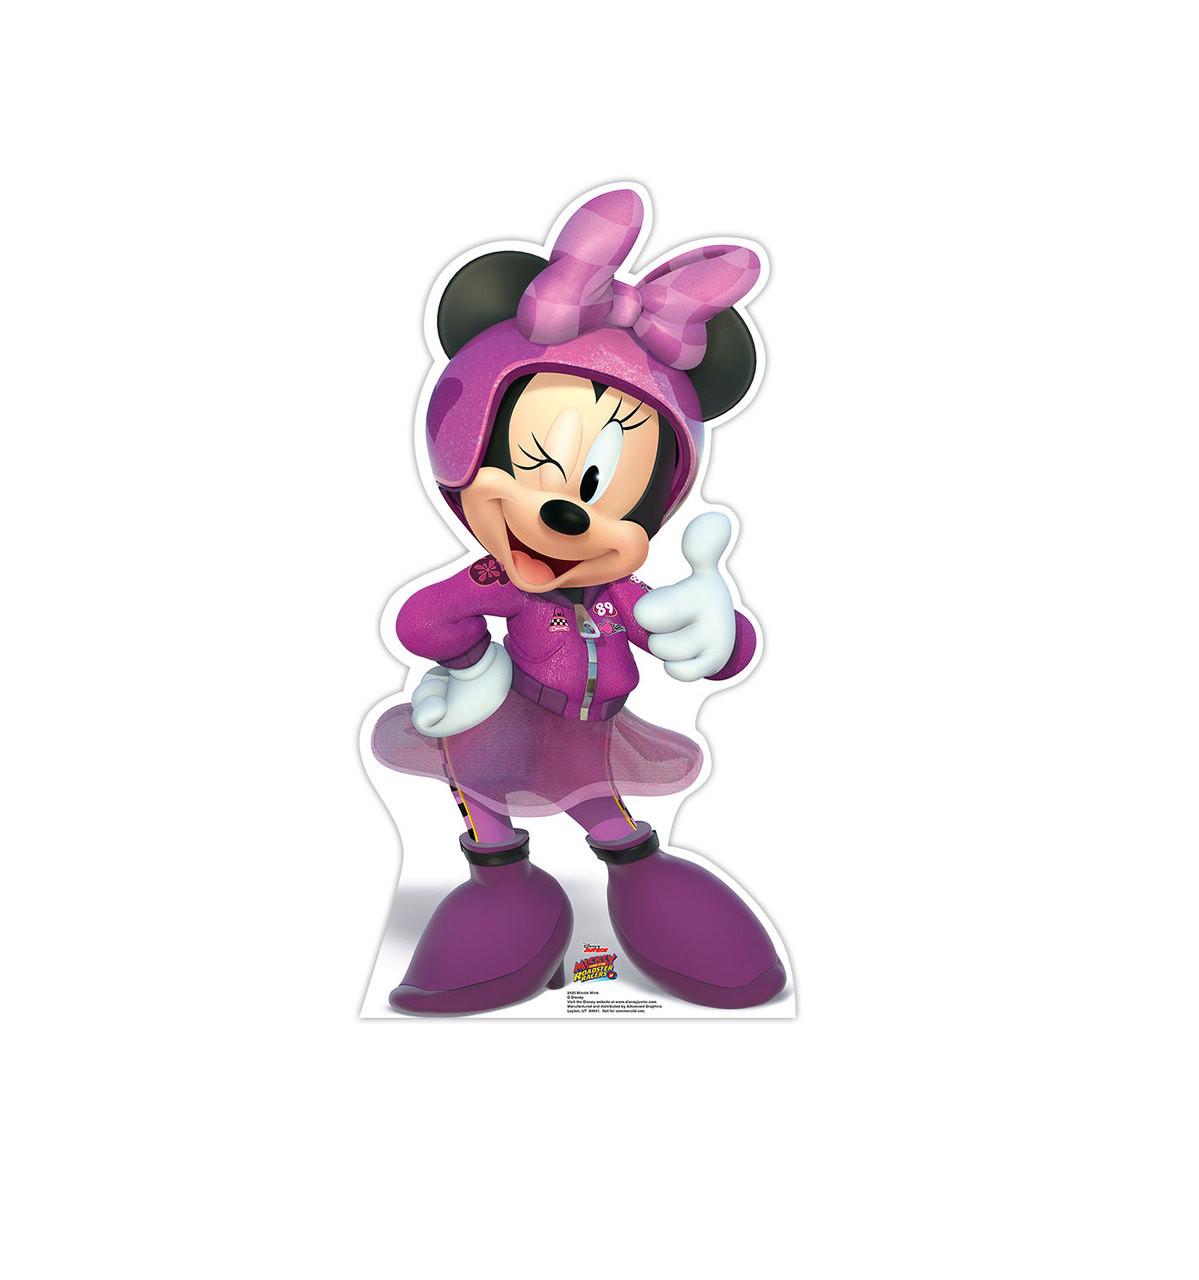 Life-size Minnie Wink (Disney's Roadster Racers) Cardboard Standup 3